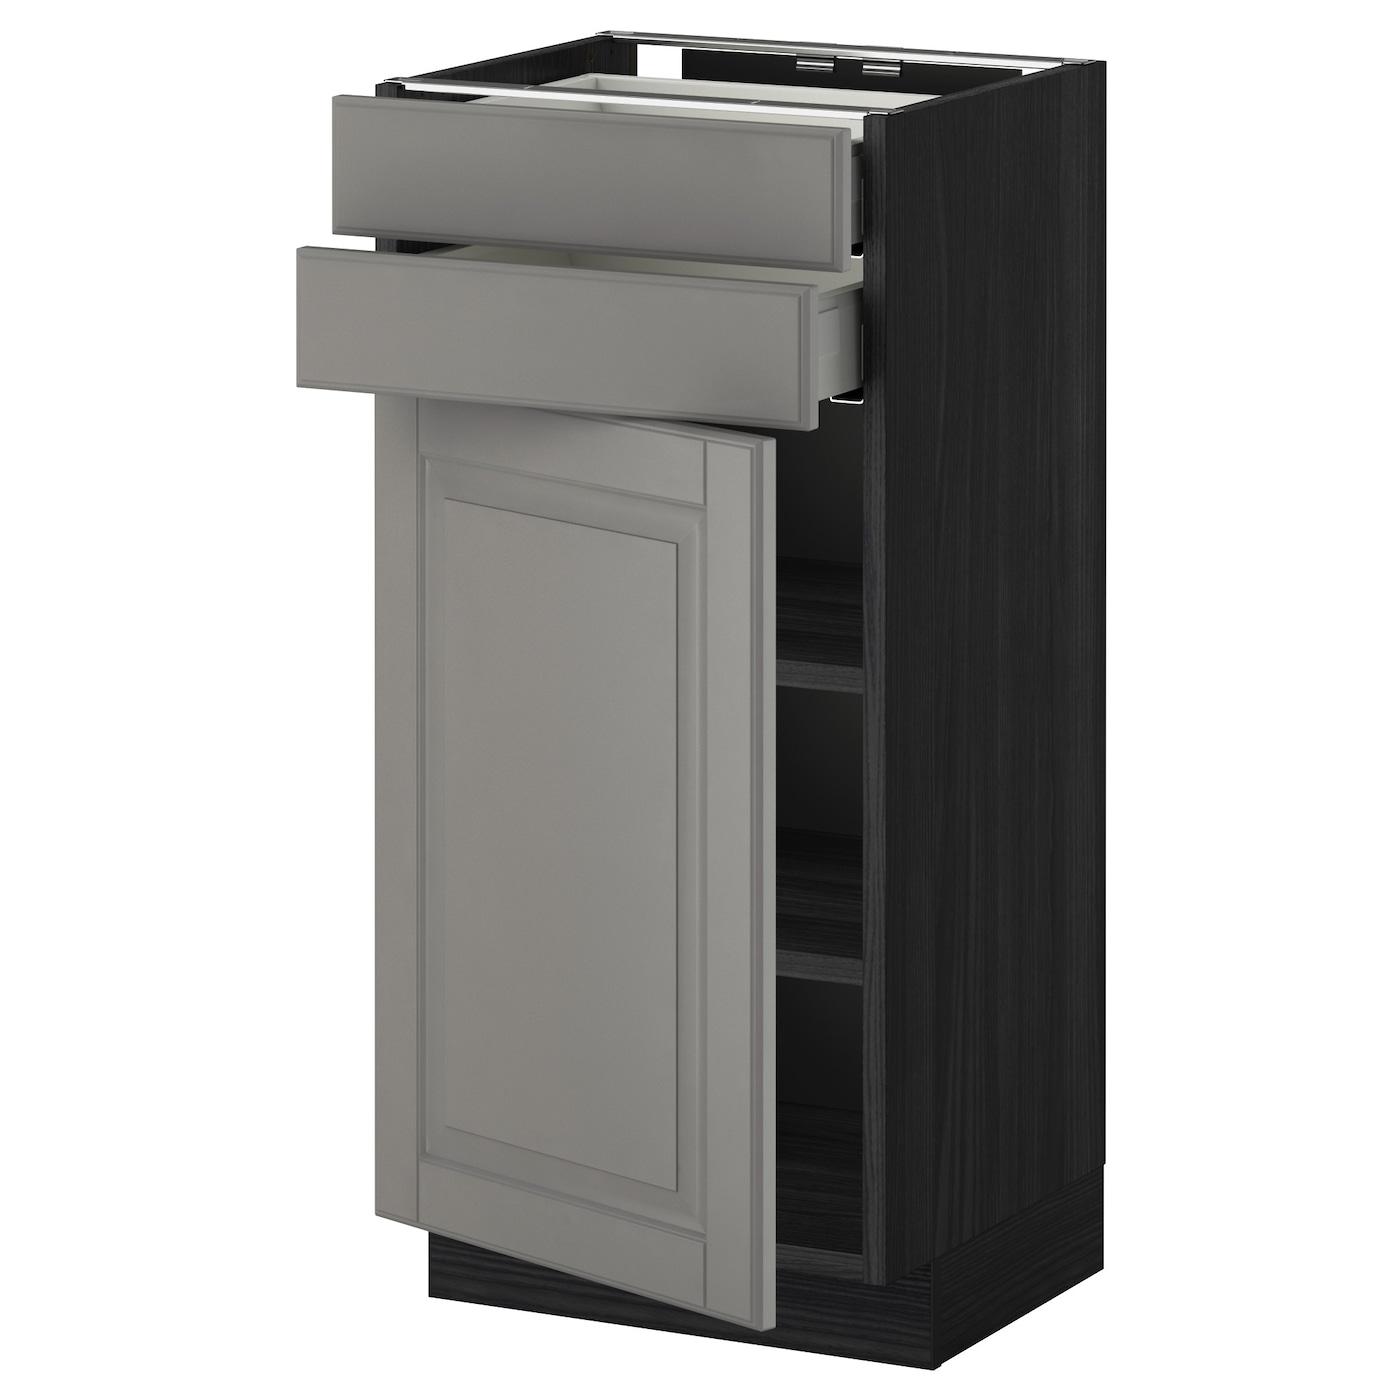 Metod maximera base cabinet w door 2 drawers black bodbyn for Black kitchen base cabinets